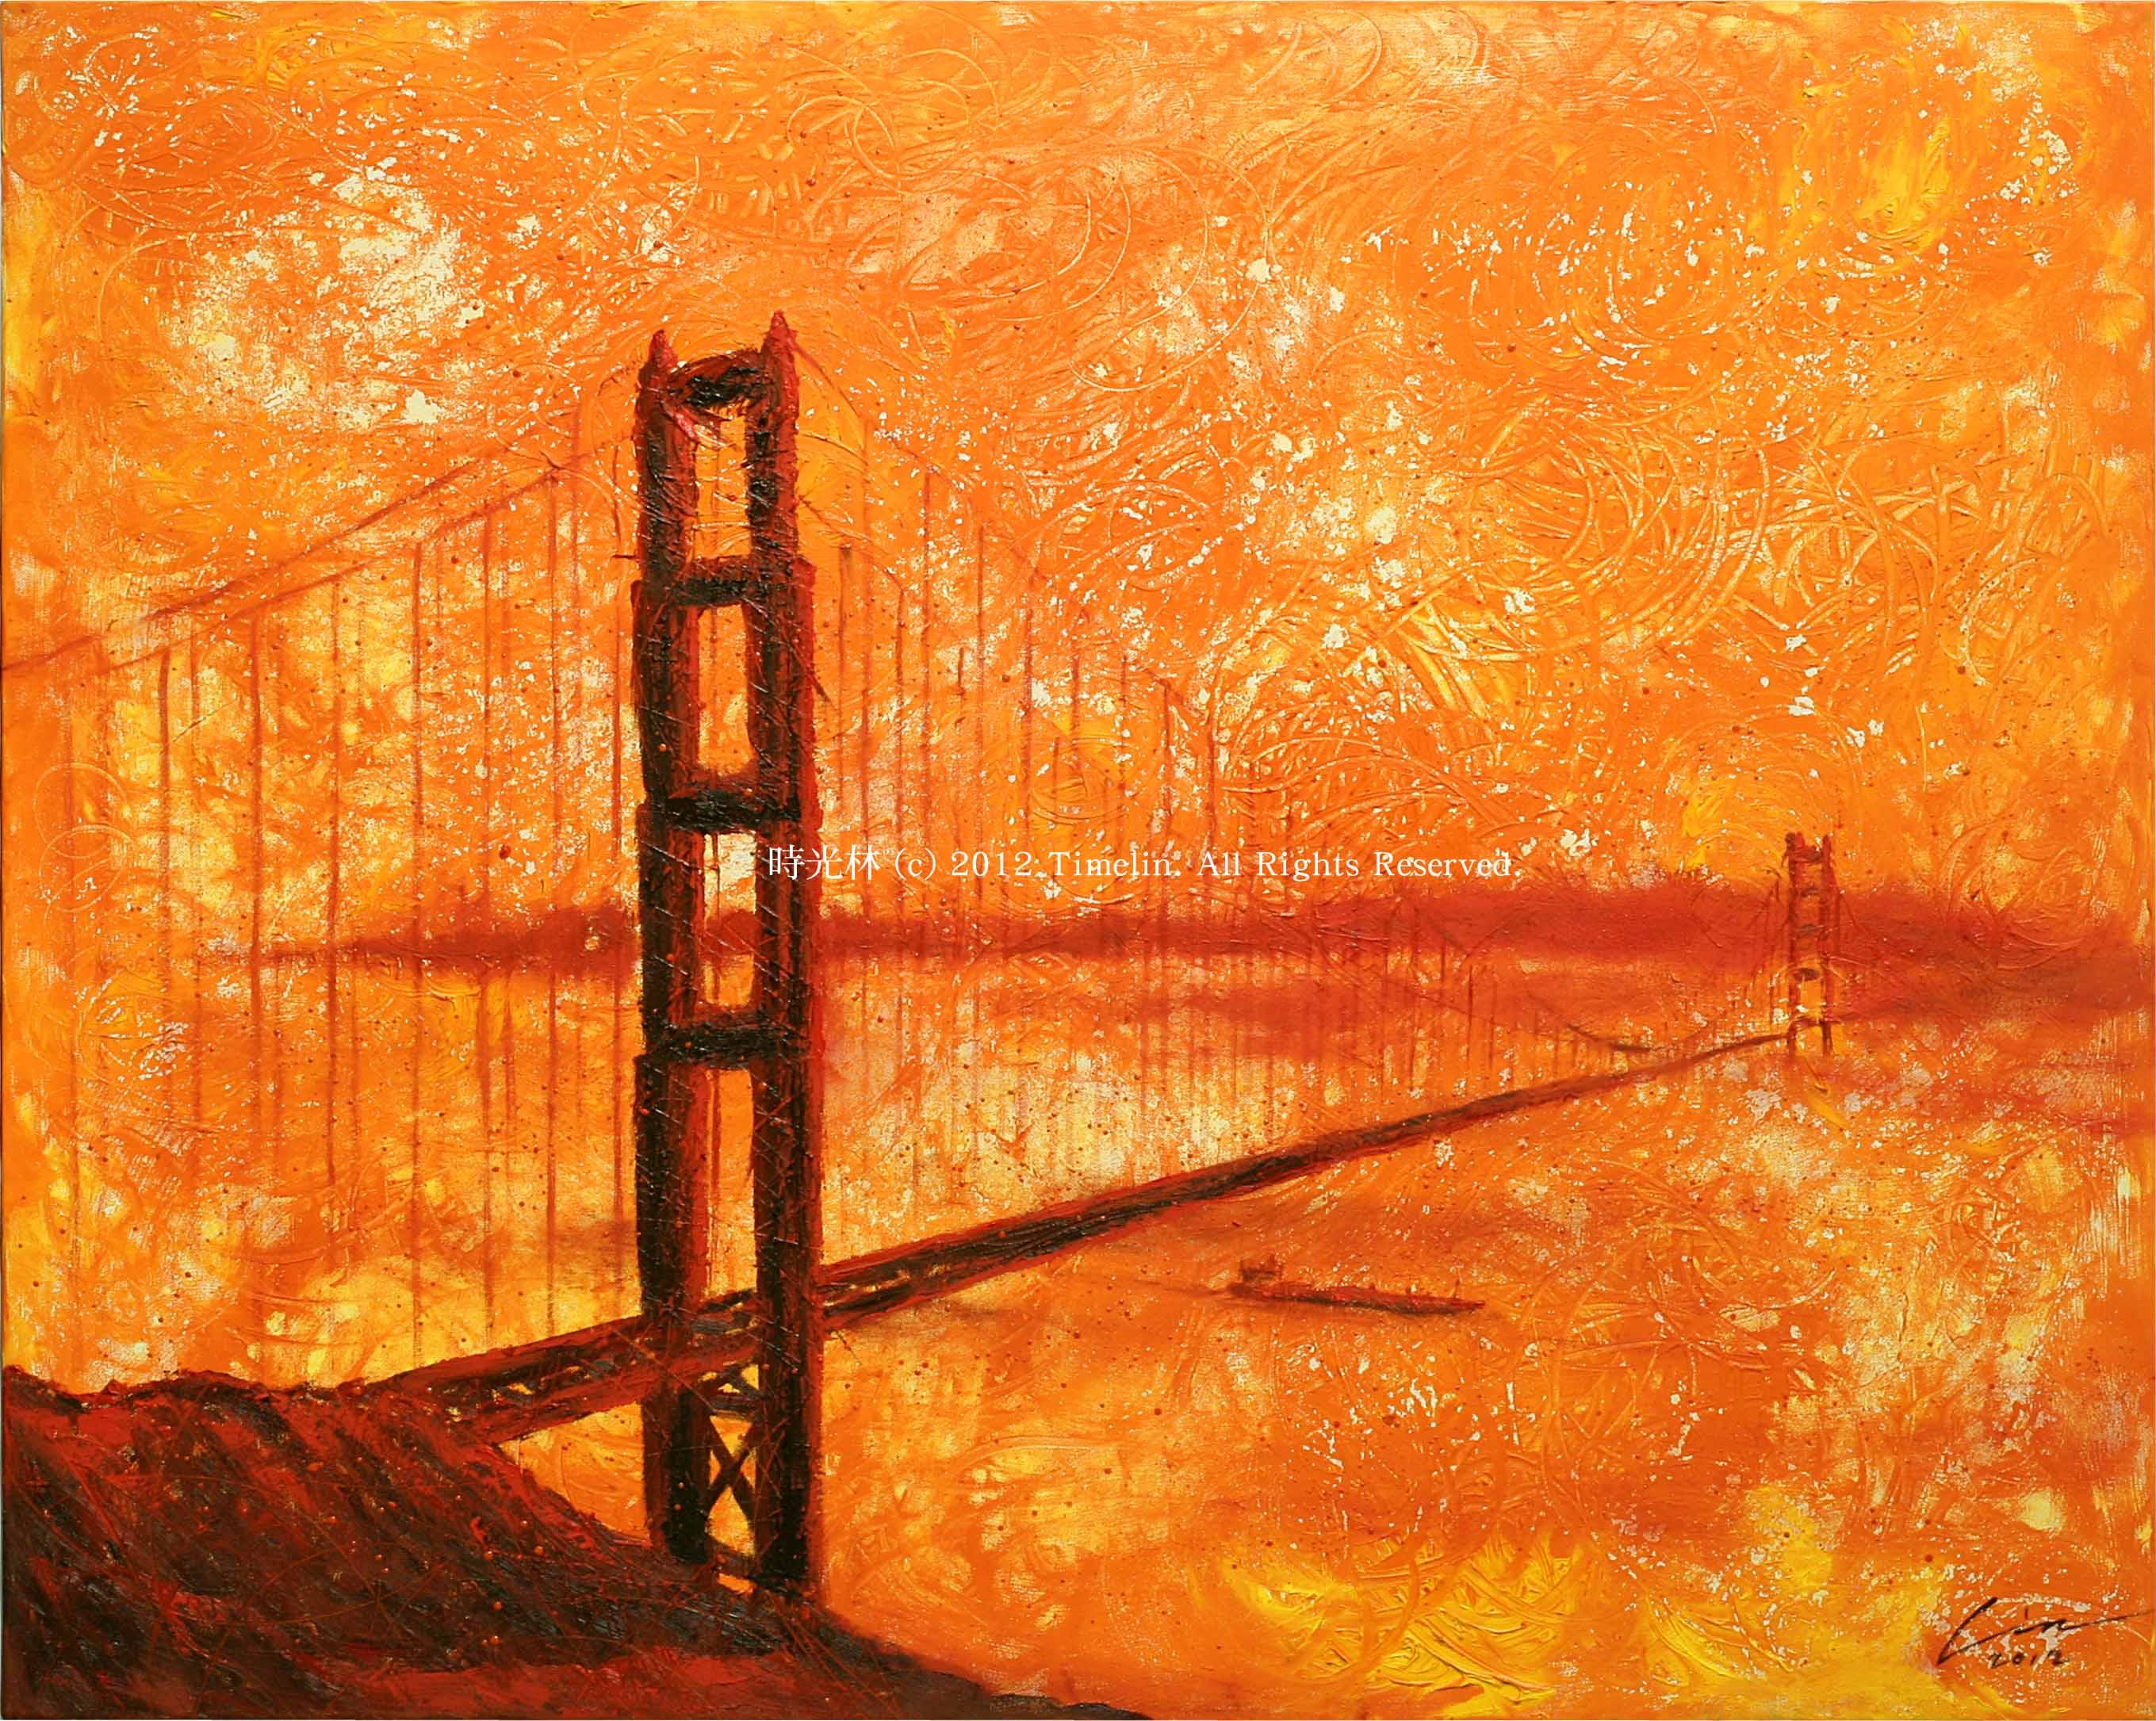 舊金山時光San Francisco Time